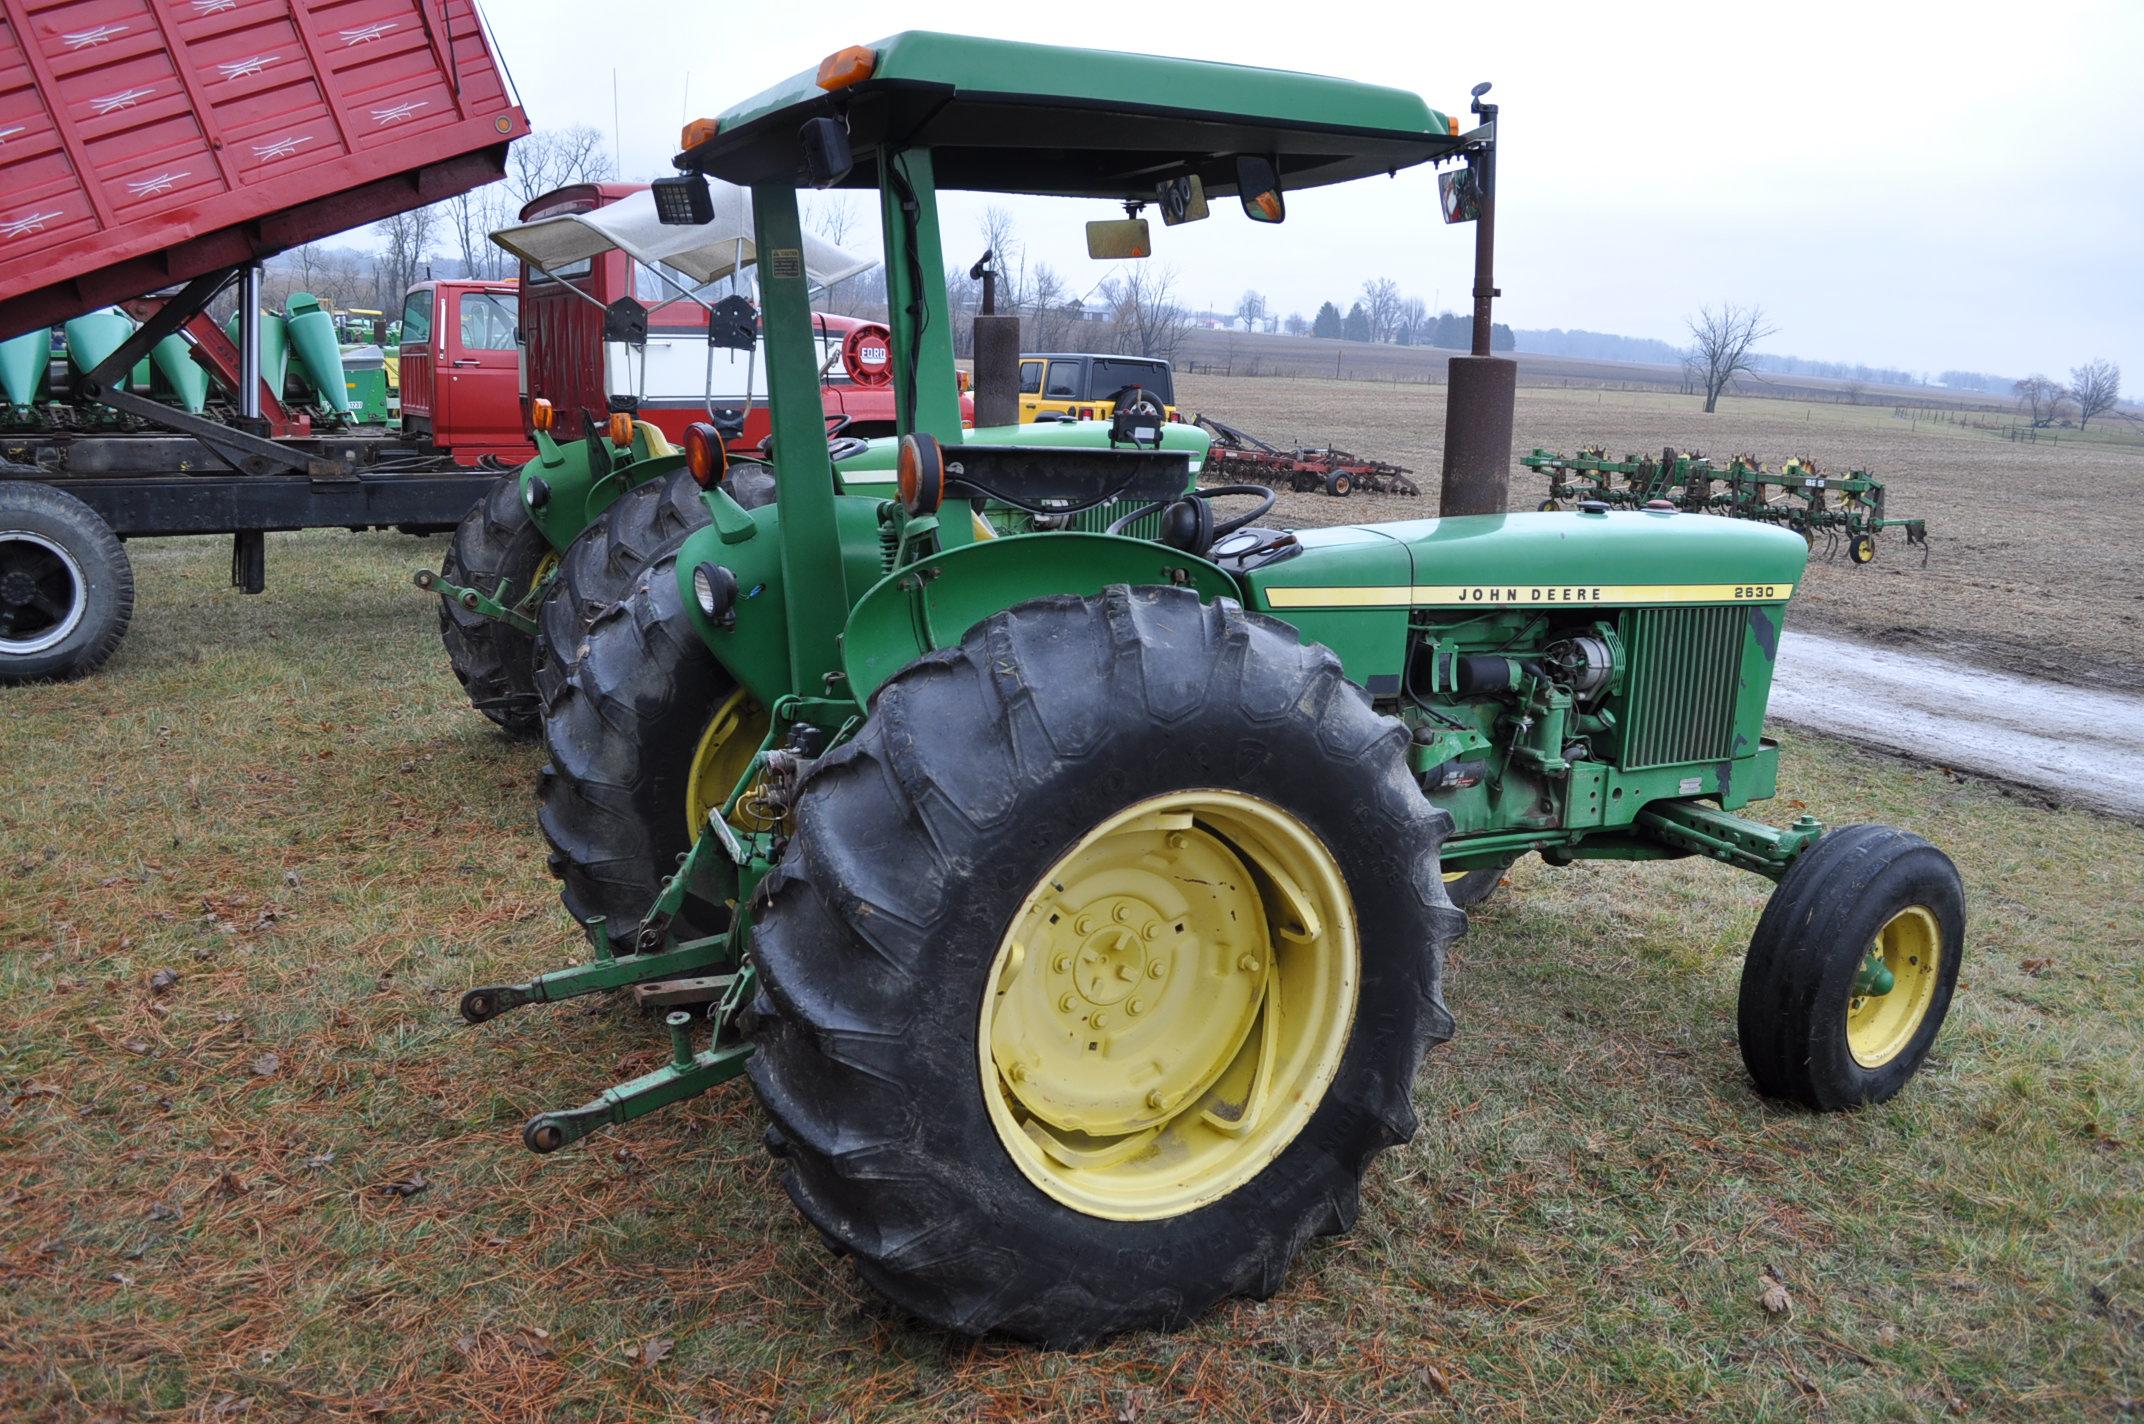 John Deere 2630 tractor, diesel, 16.9-28 rear, 9.5-15 front, 1 hyd remote, 540 pto, 3 pt, 4260 - Image 3 of 18